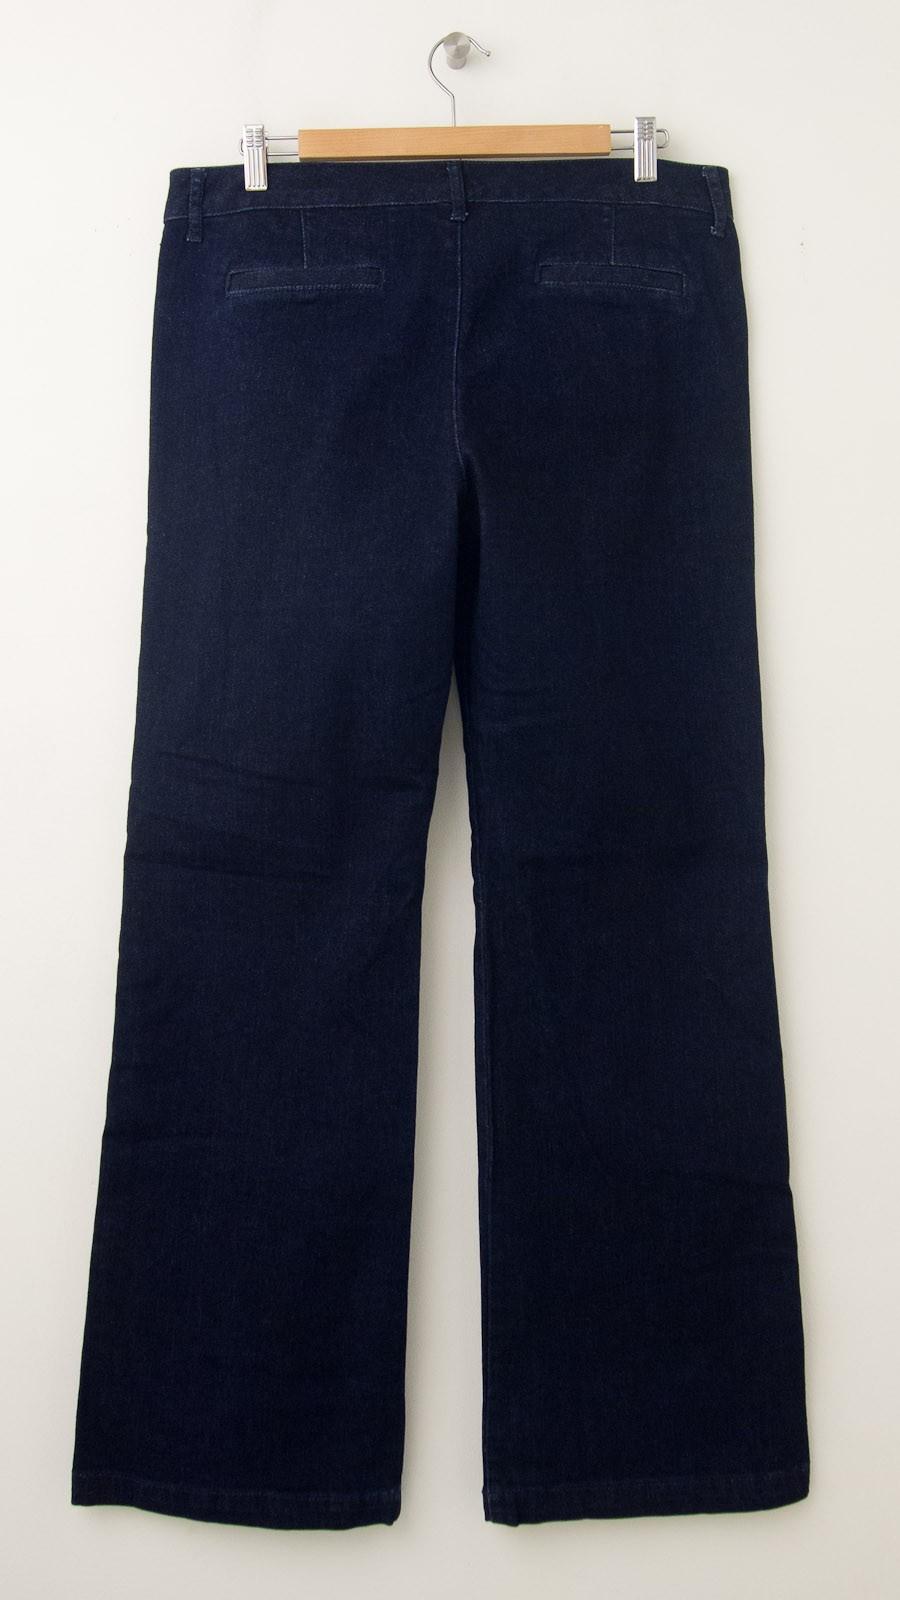 Banana Republic Trouser Jeans Women s 31S Short